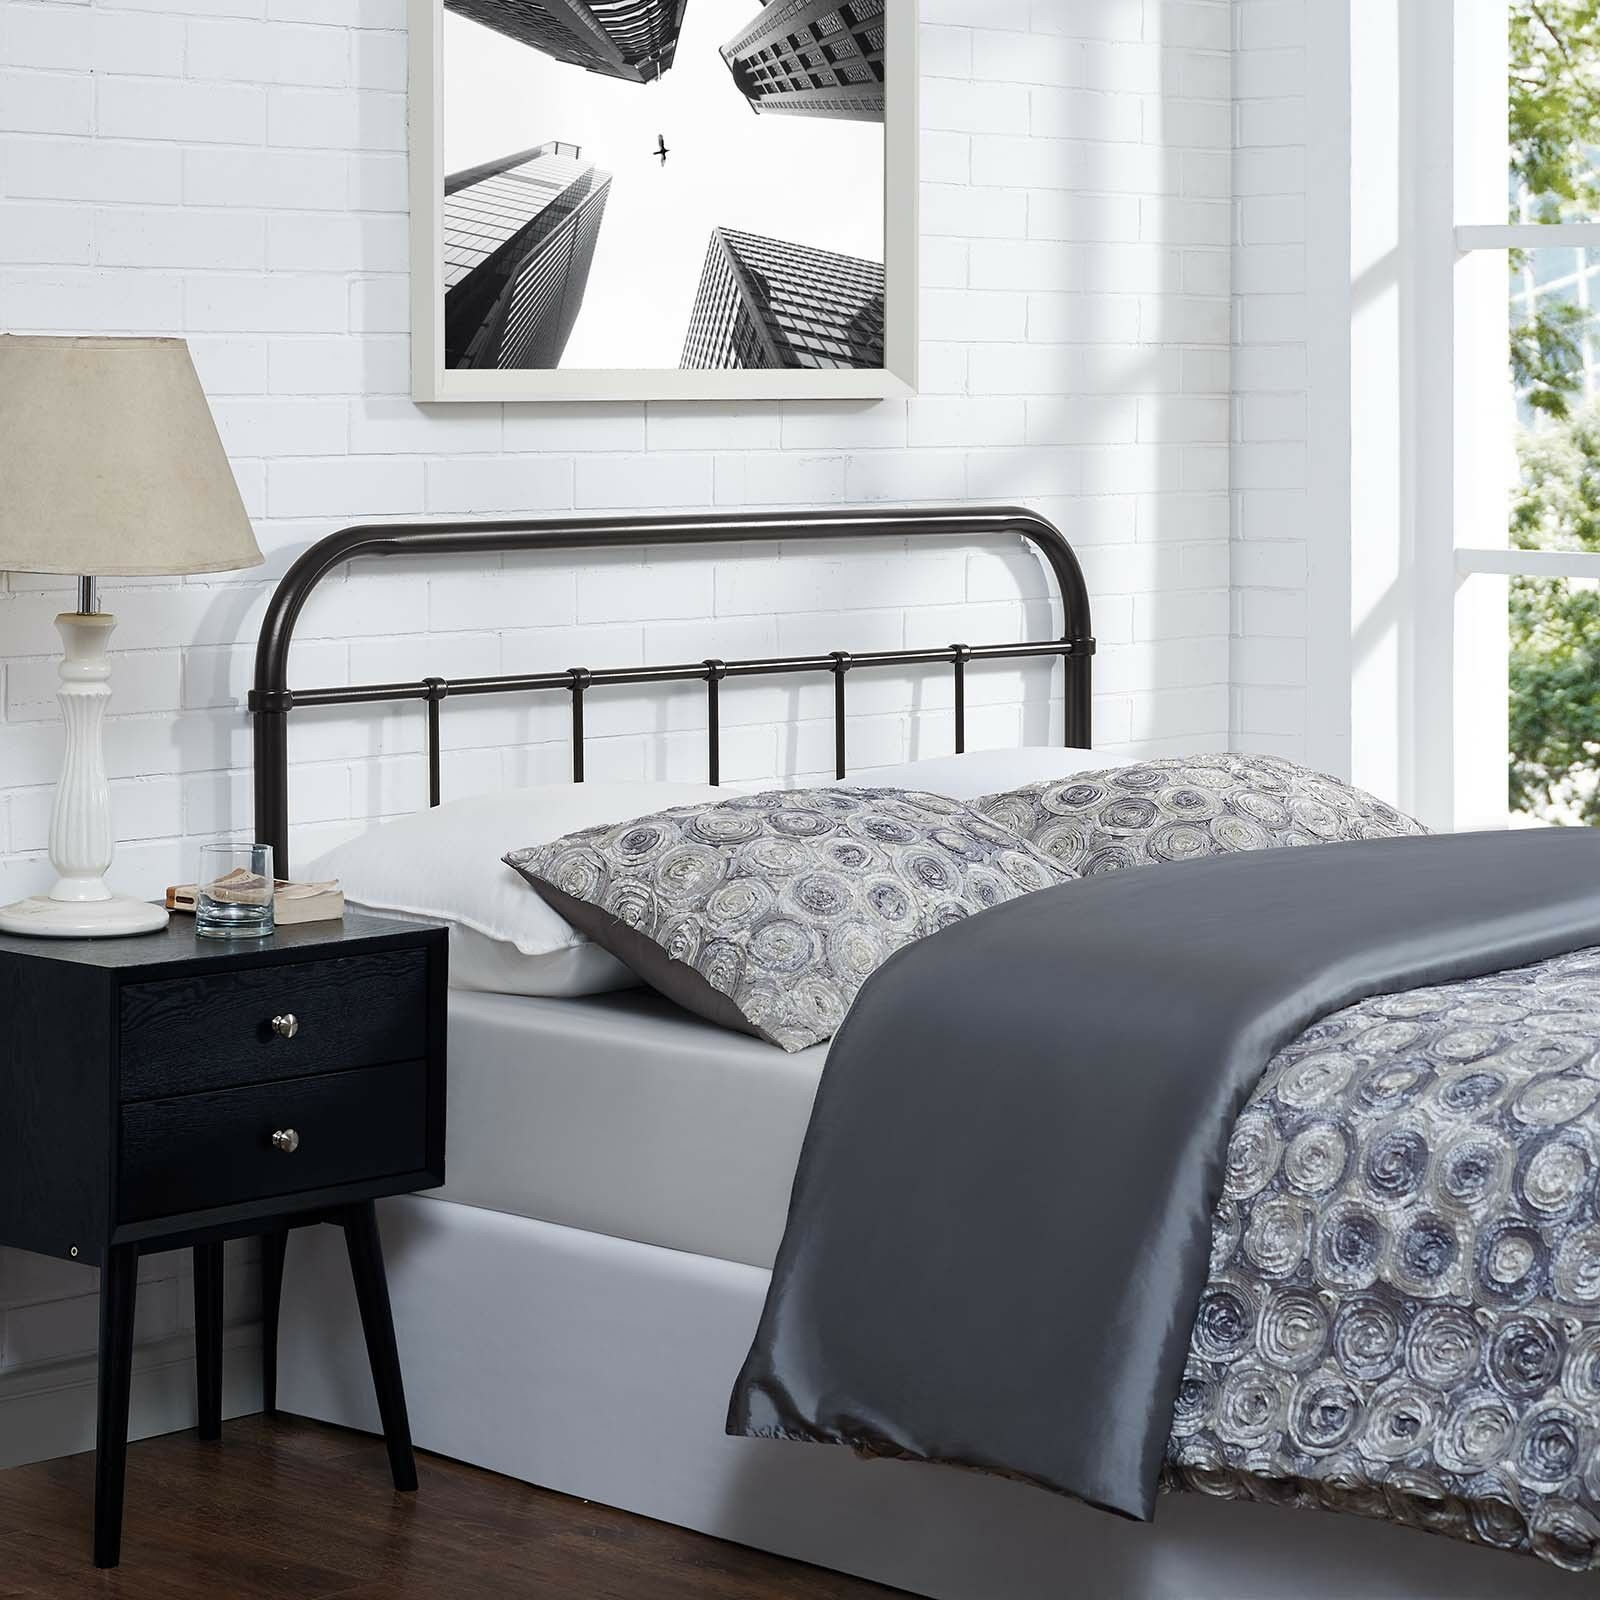 Details About Bedroom Furniture Rustic Modern Farmhouse Brown Steel Metal Queen Size Headboard